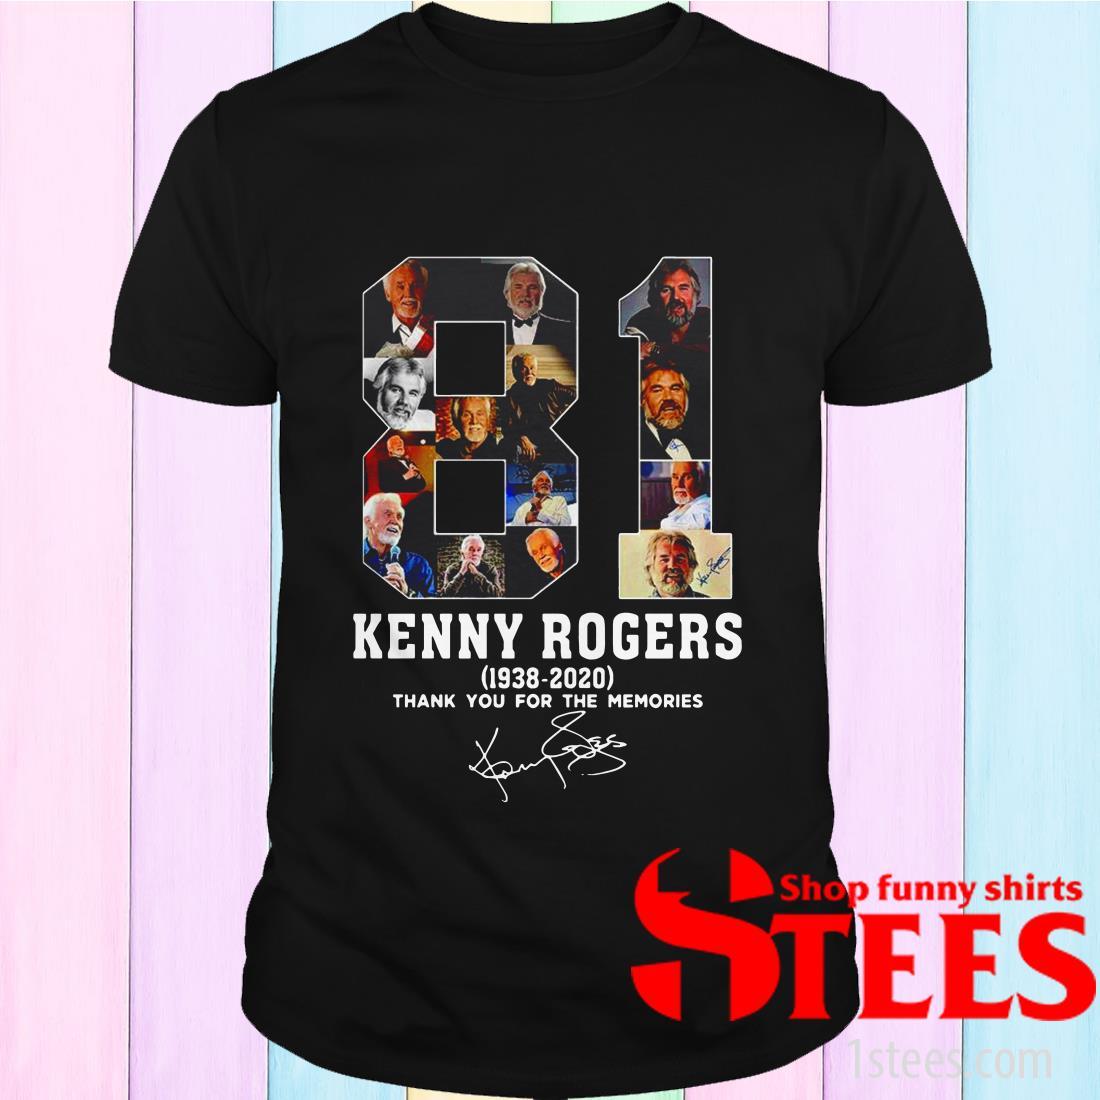 81 Kenny Rogers 1938-2020 Signature Shirt